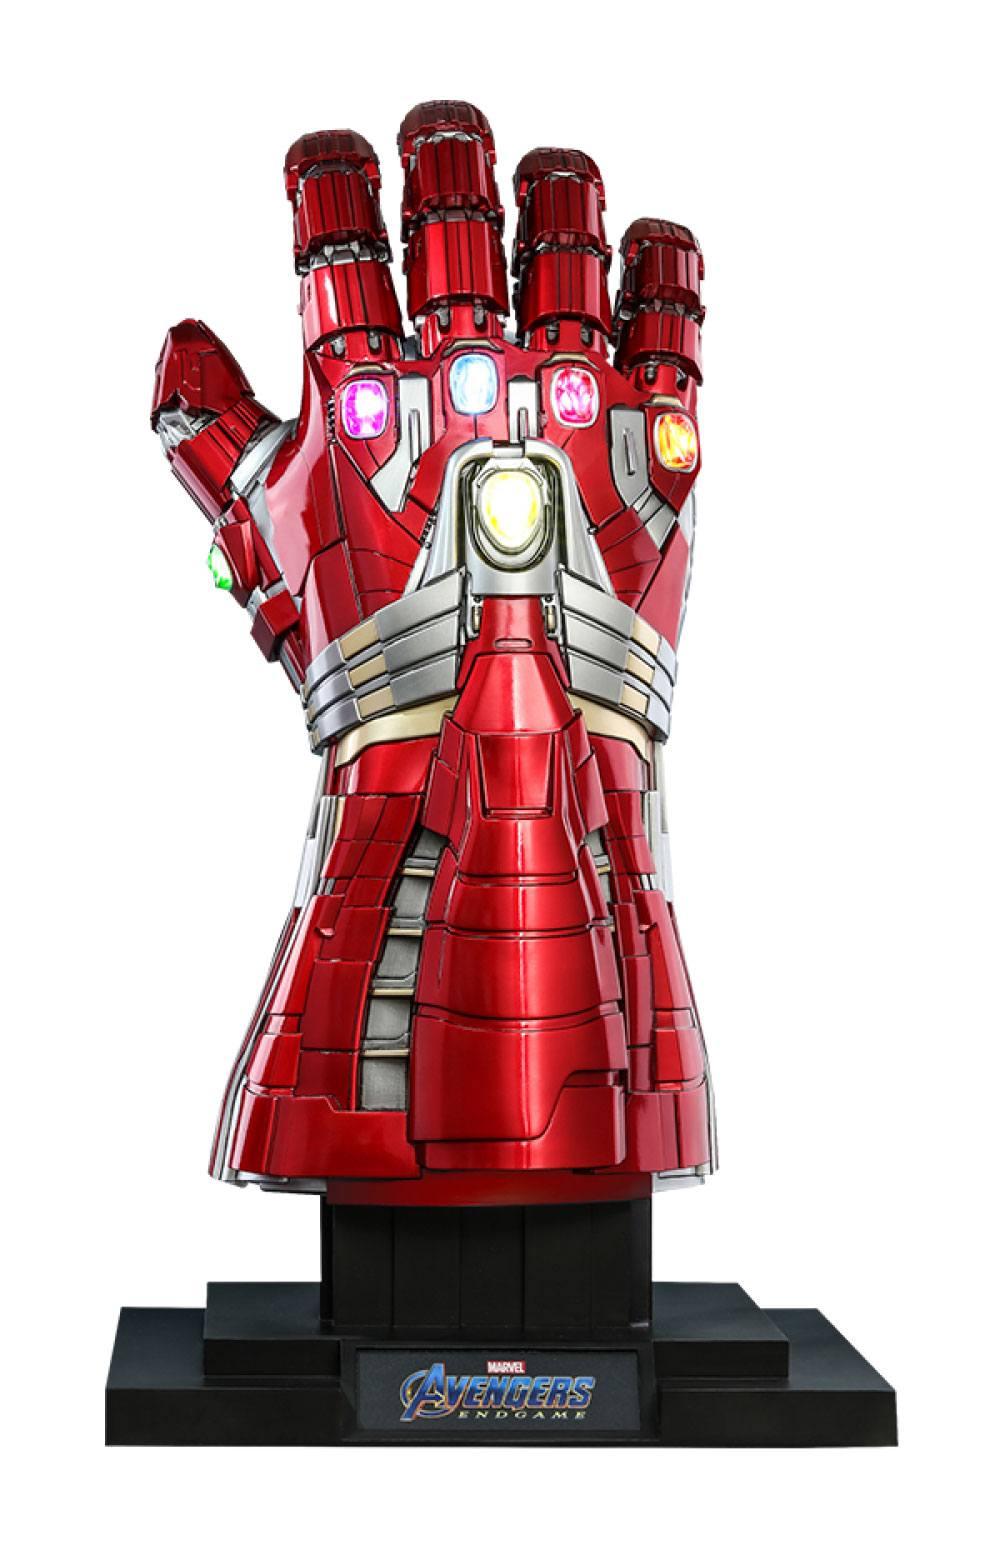 Nano Gauntlet Hulk Ver. Avengers Endgame Life-Size Masterpiece 1/1 Replica by Hot Toys